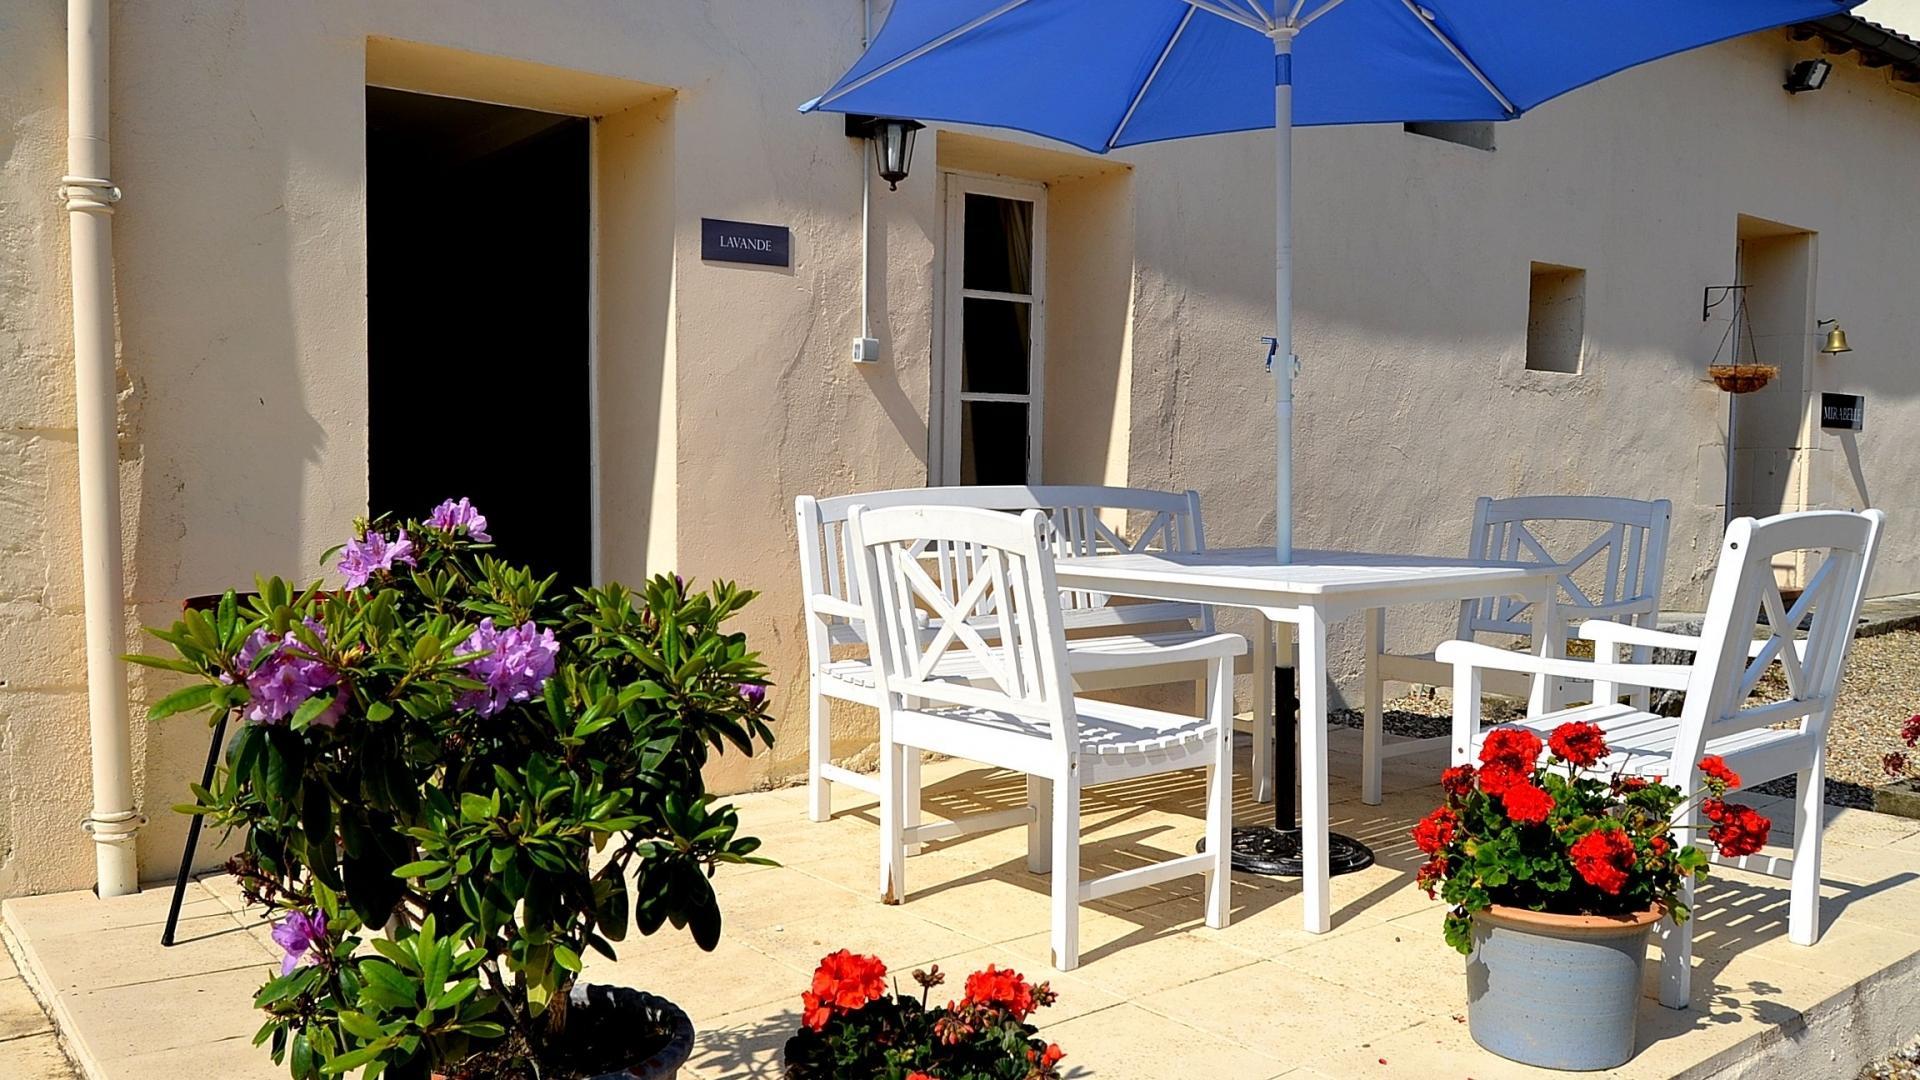 2 Bedroom Gite complex in Poitou-Charentes, France